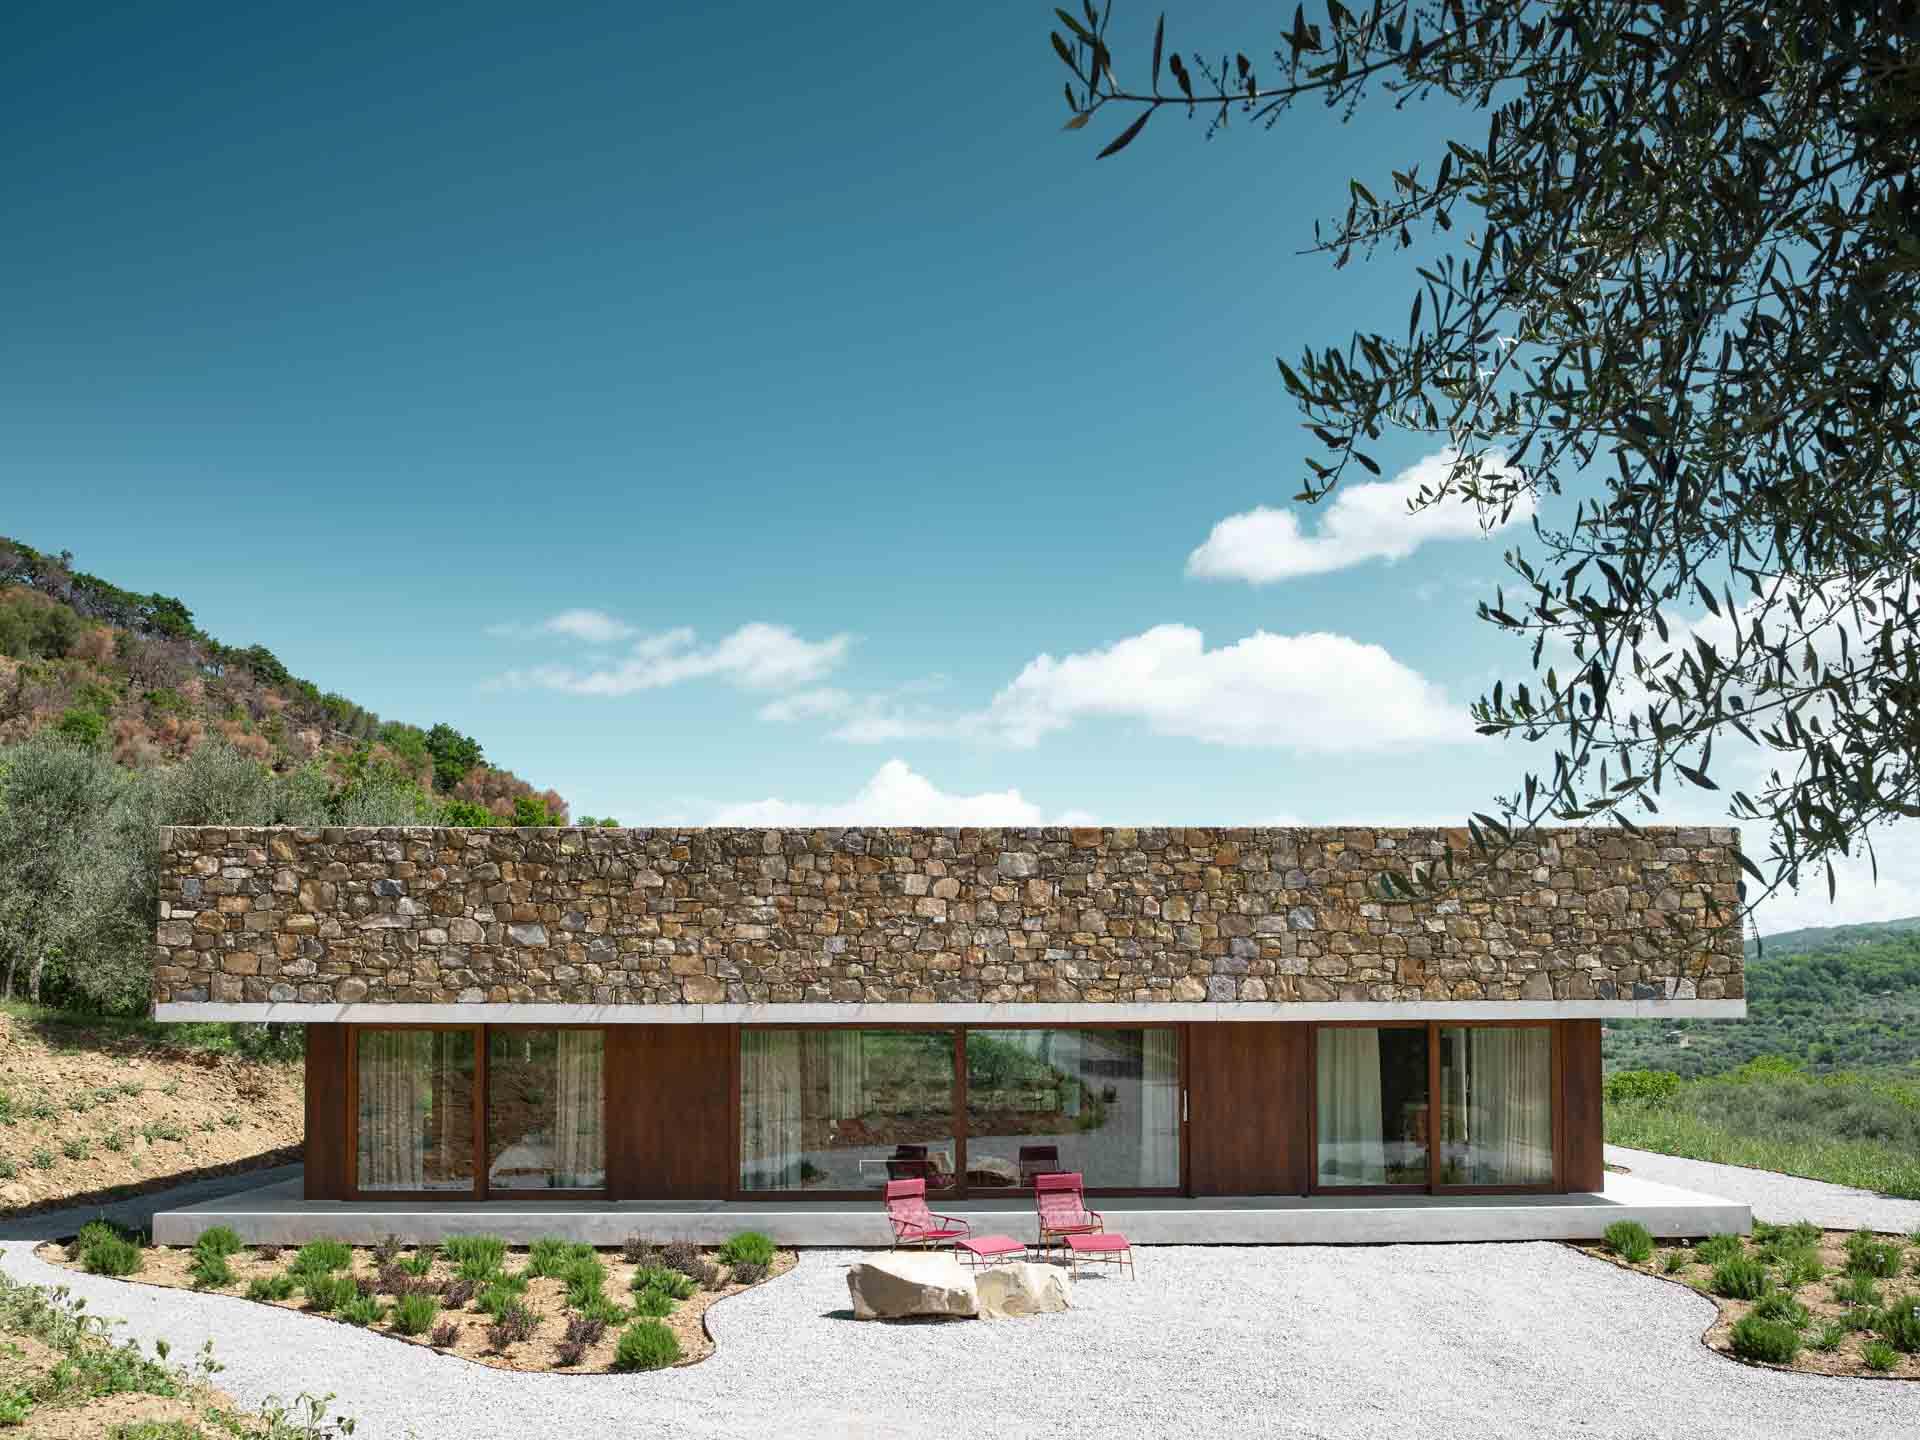 353.-Gardini-Gibertini-HV-Pavilion-photographed-by-Ezio-Manciucca03.jpeg